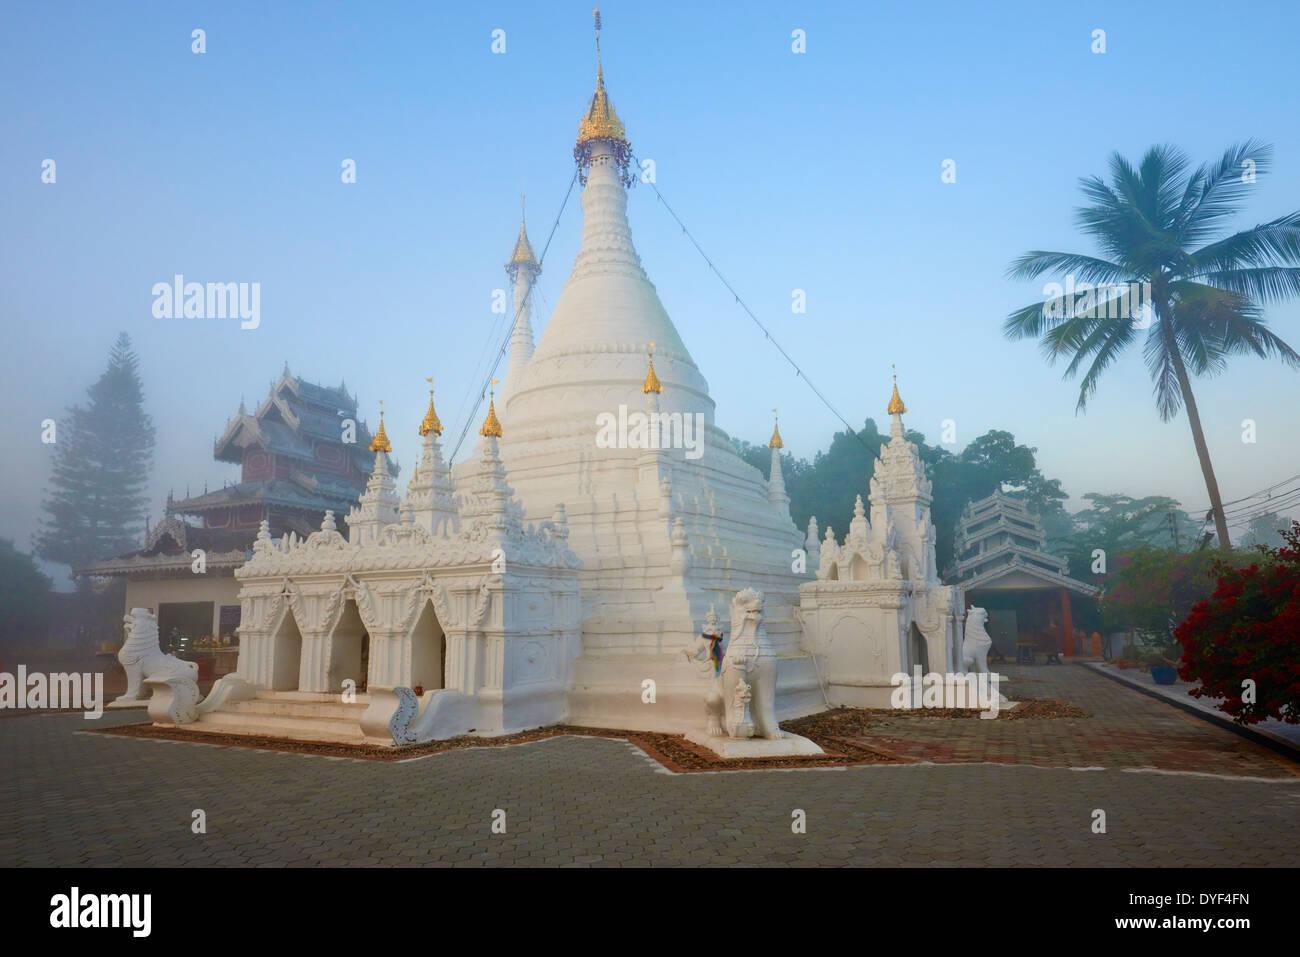 Thailand, Mae Hong Son, Wat Phra That Doi Kong Mu - Stock Image